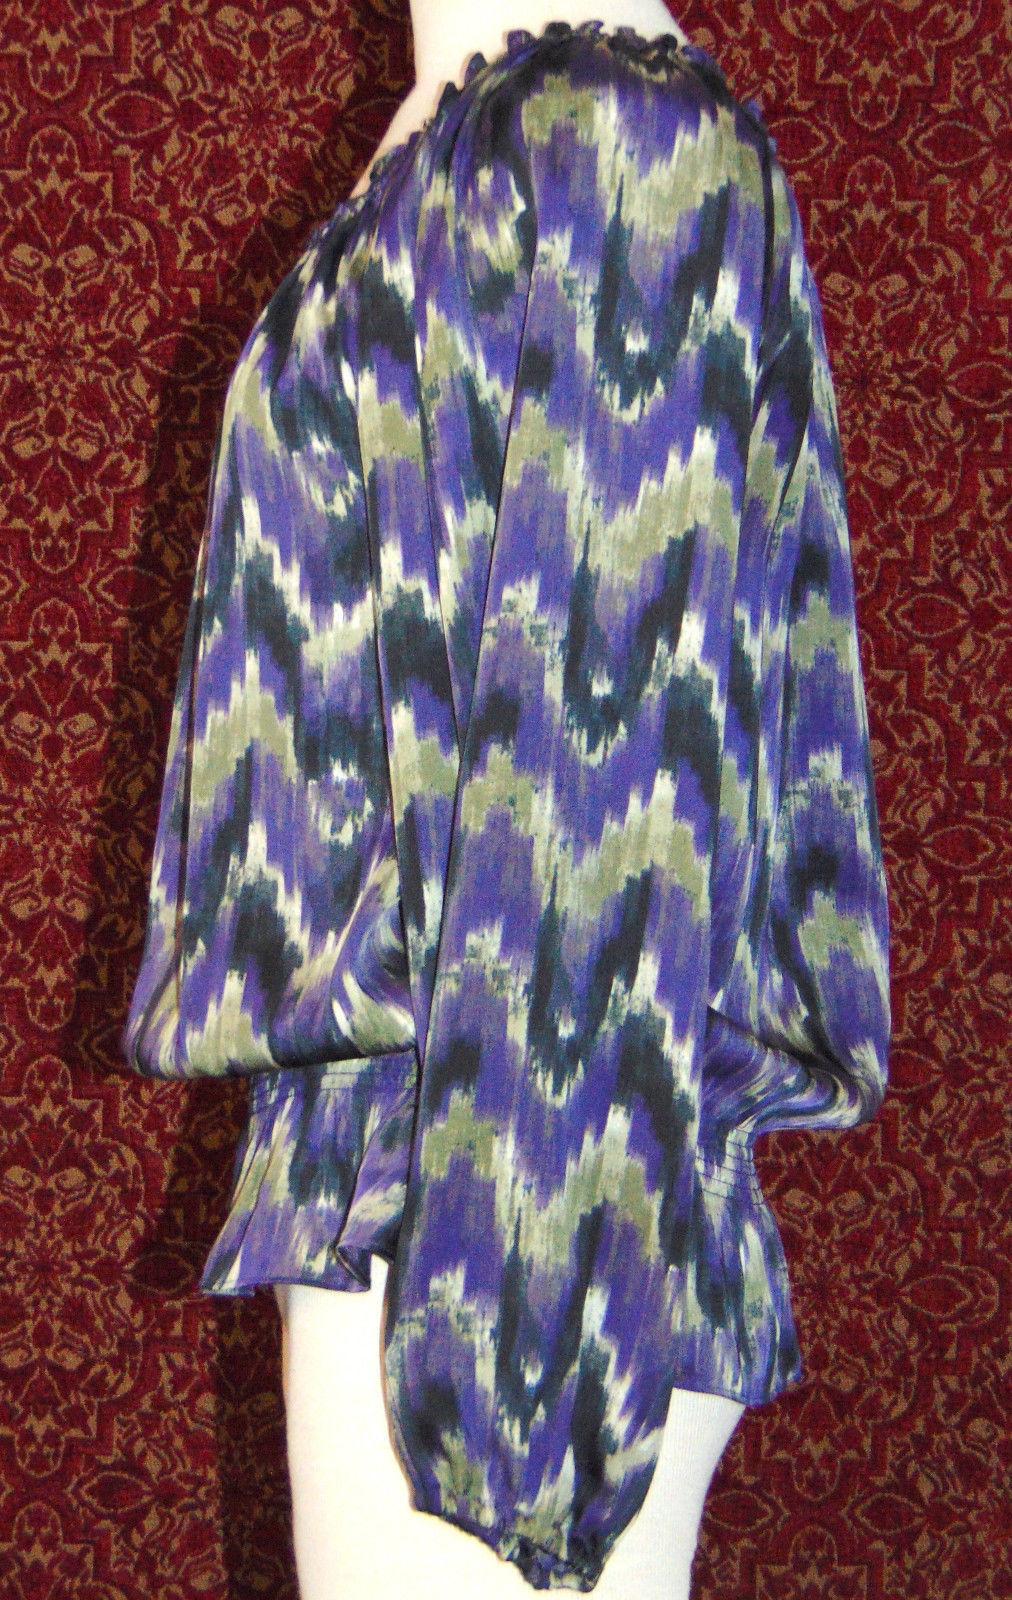 MICHAEL KORS purple polyester long sleeve blouse M (T47-01C8G) image 7